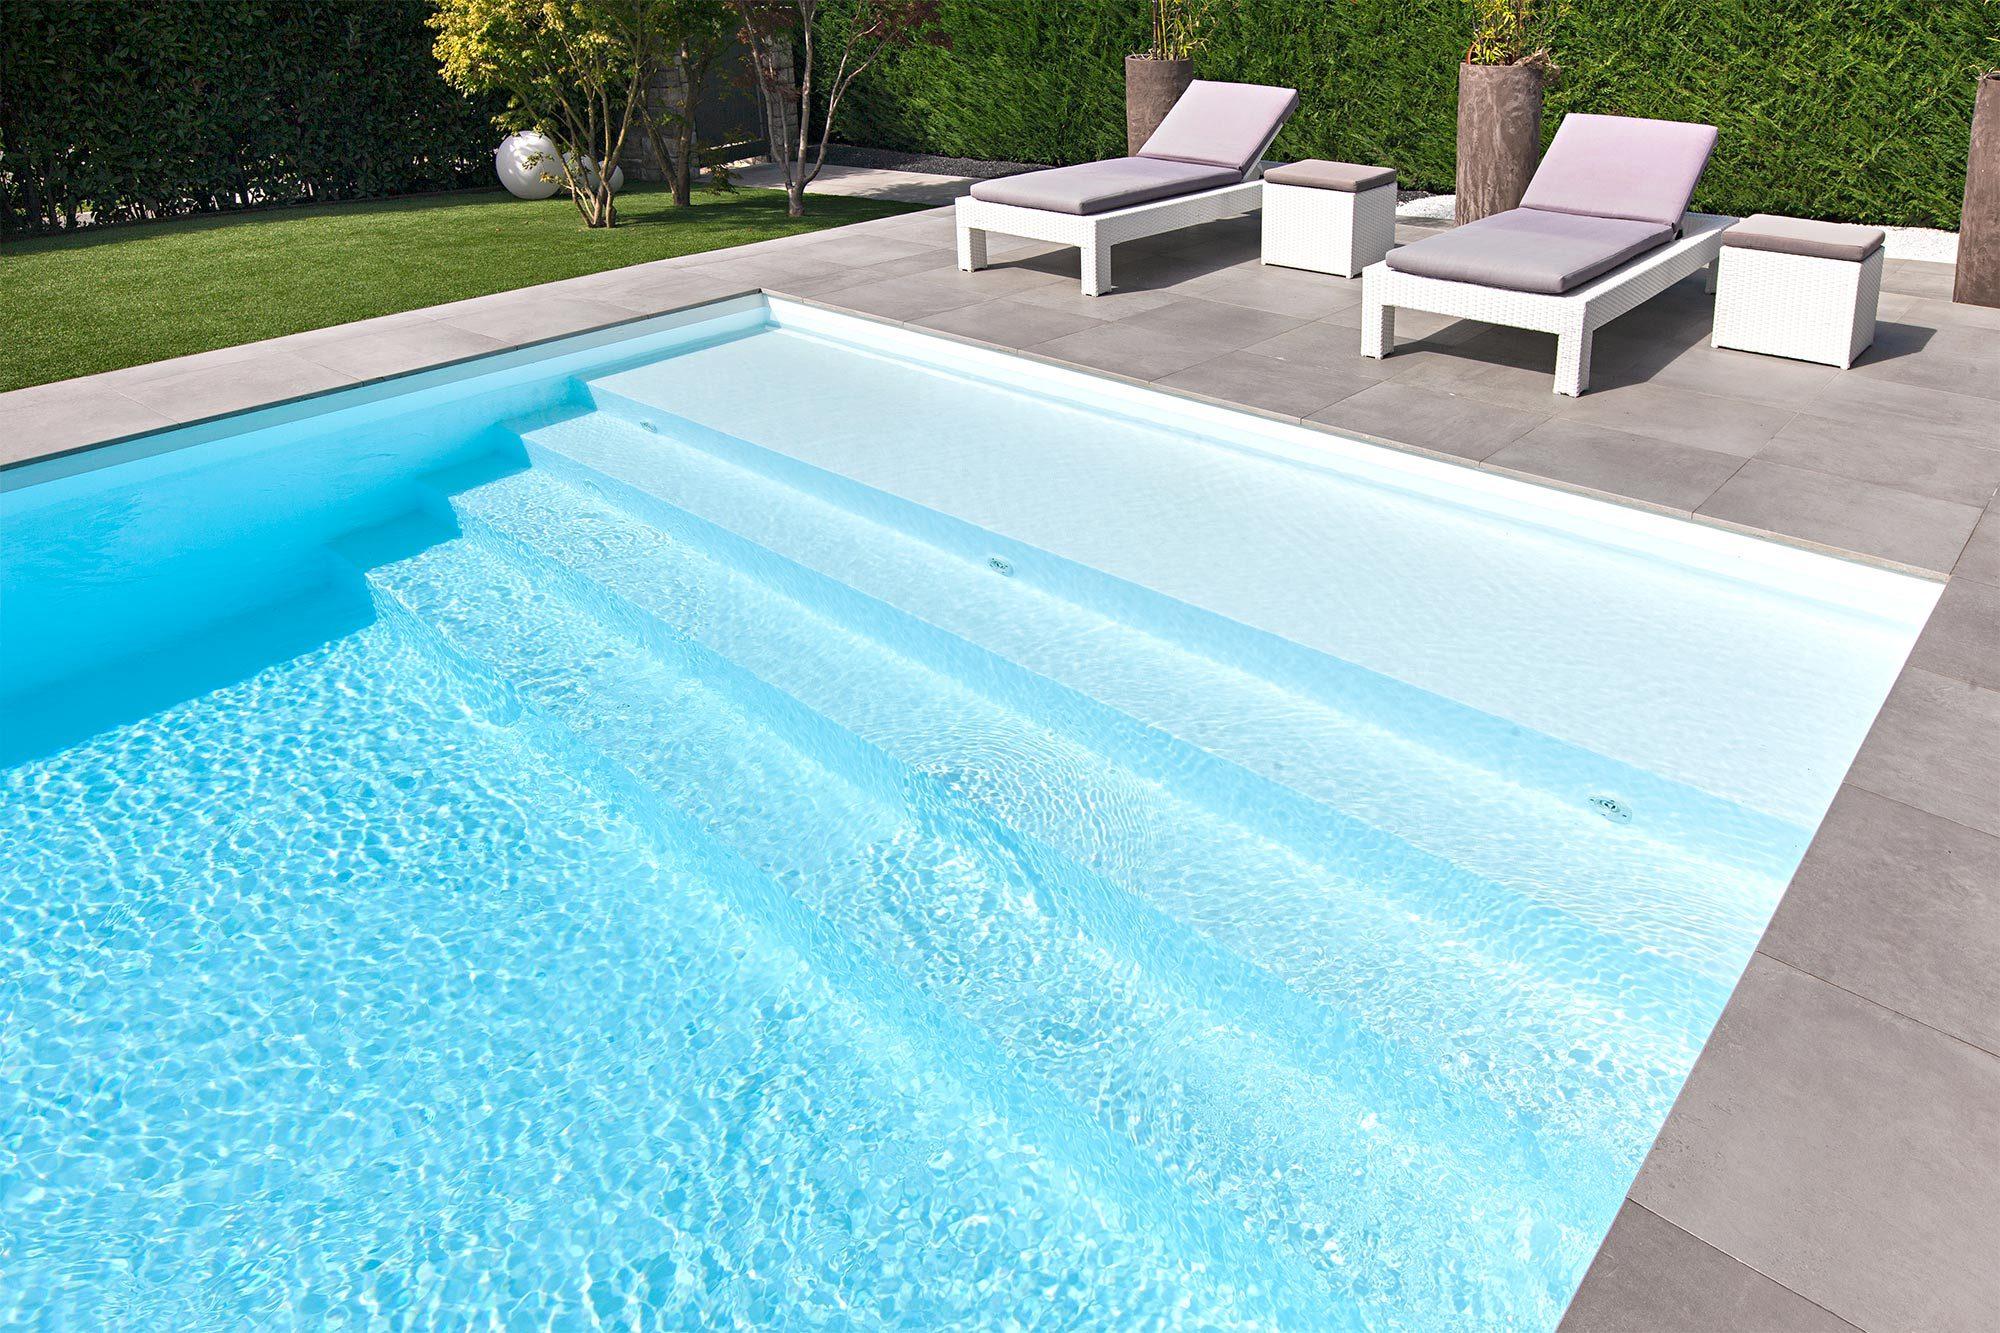 piscina interrata con sdraio e sedute relax a bordo vasca